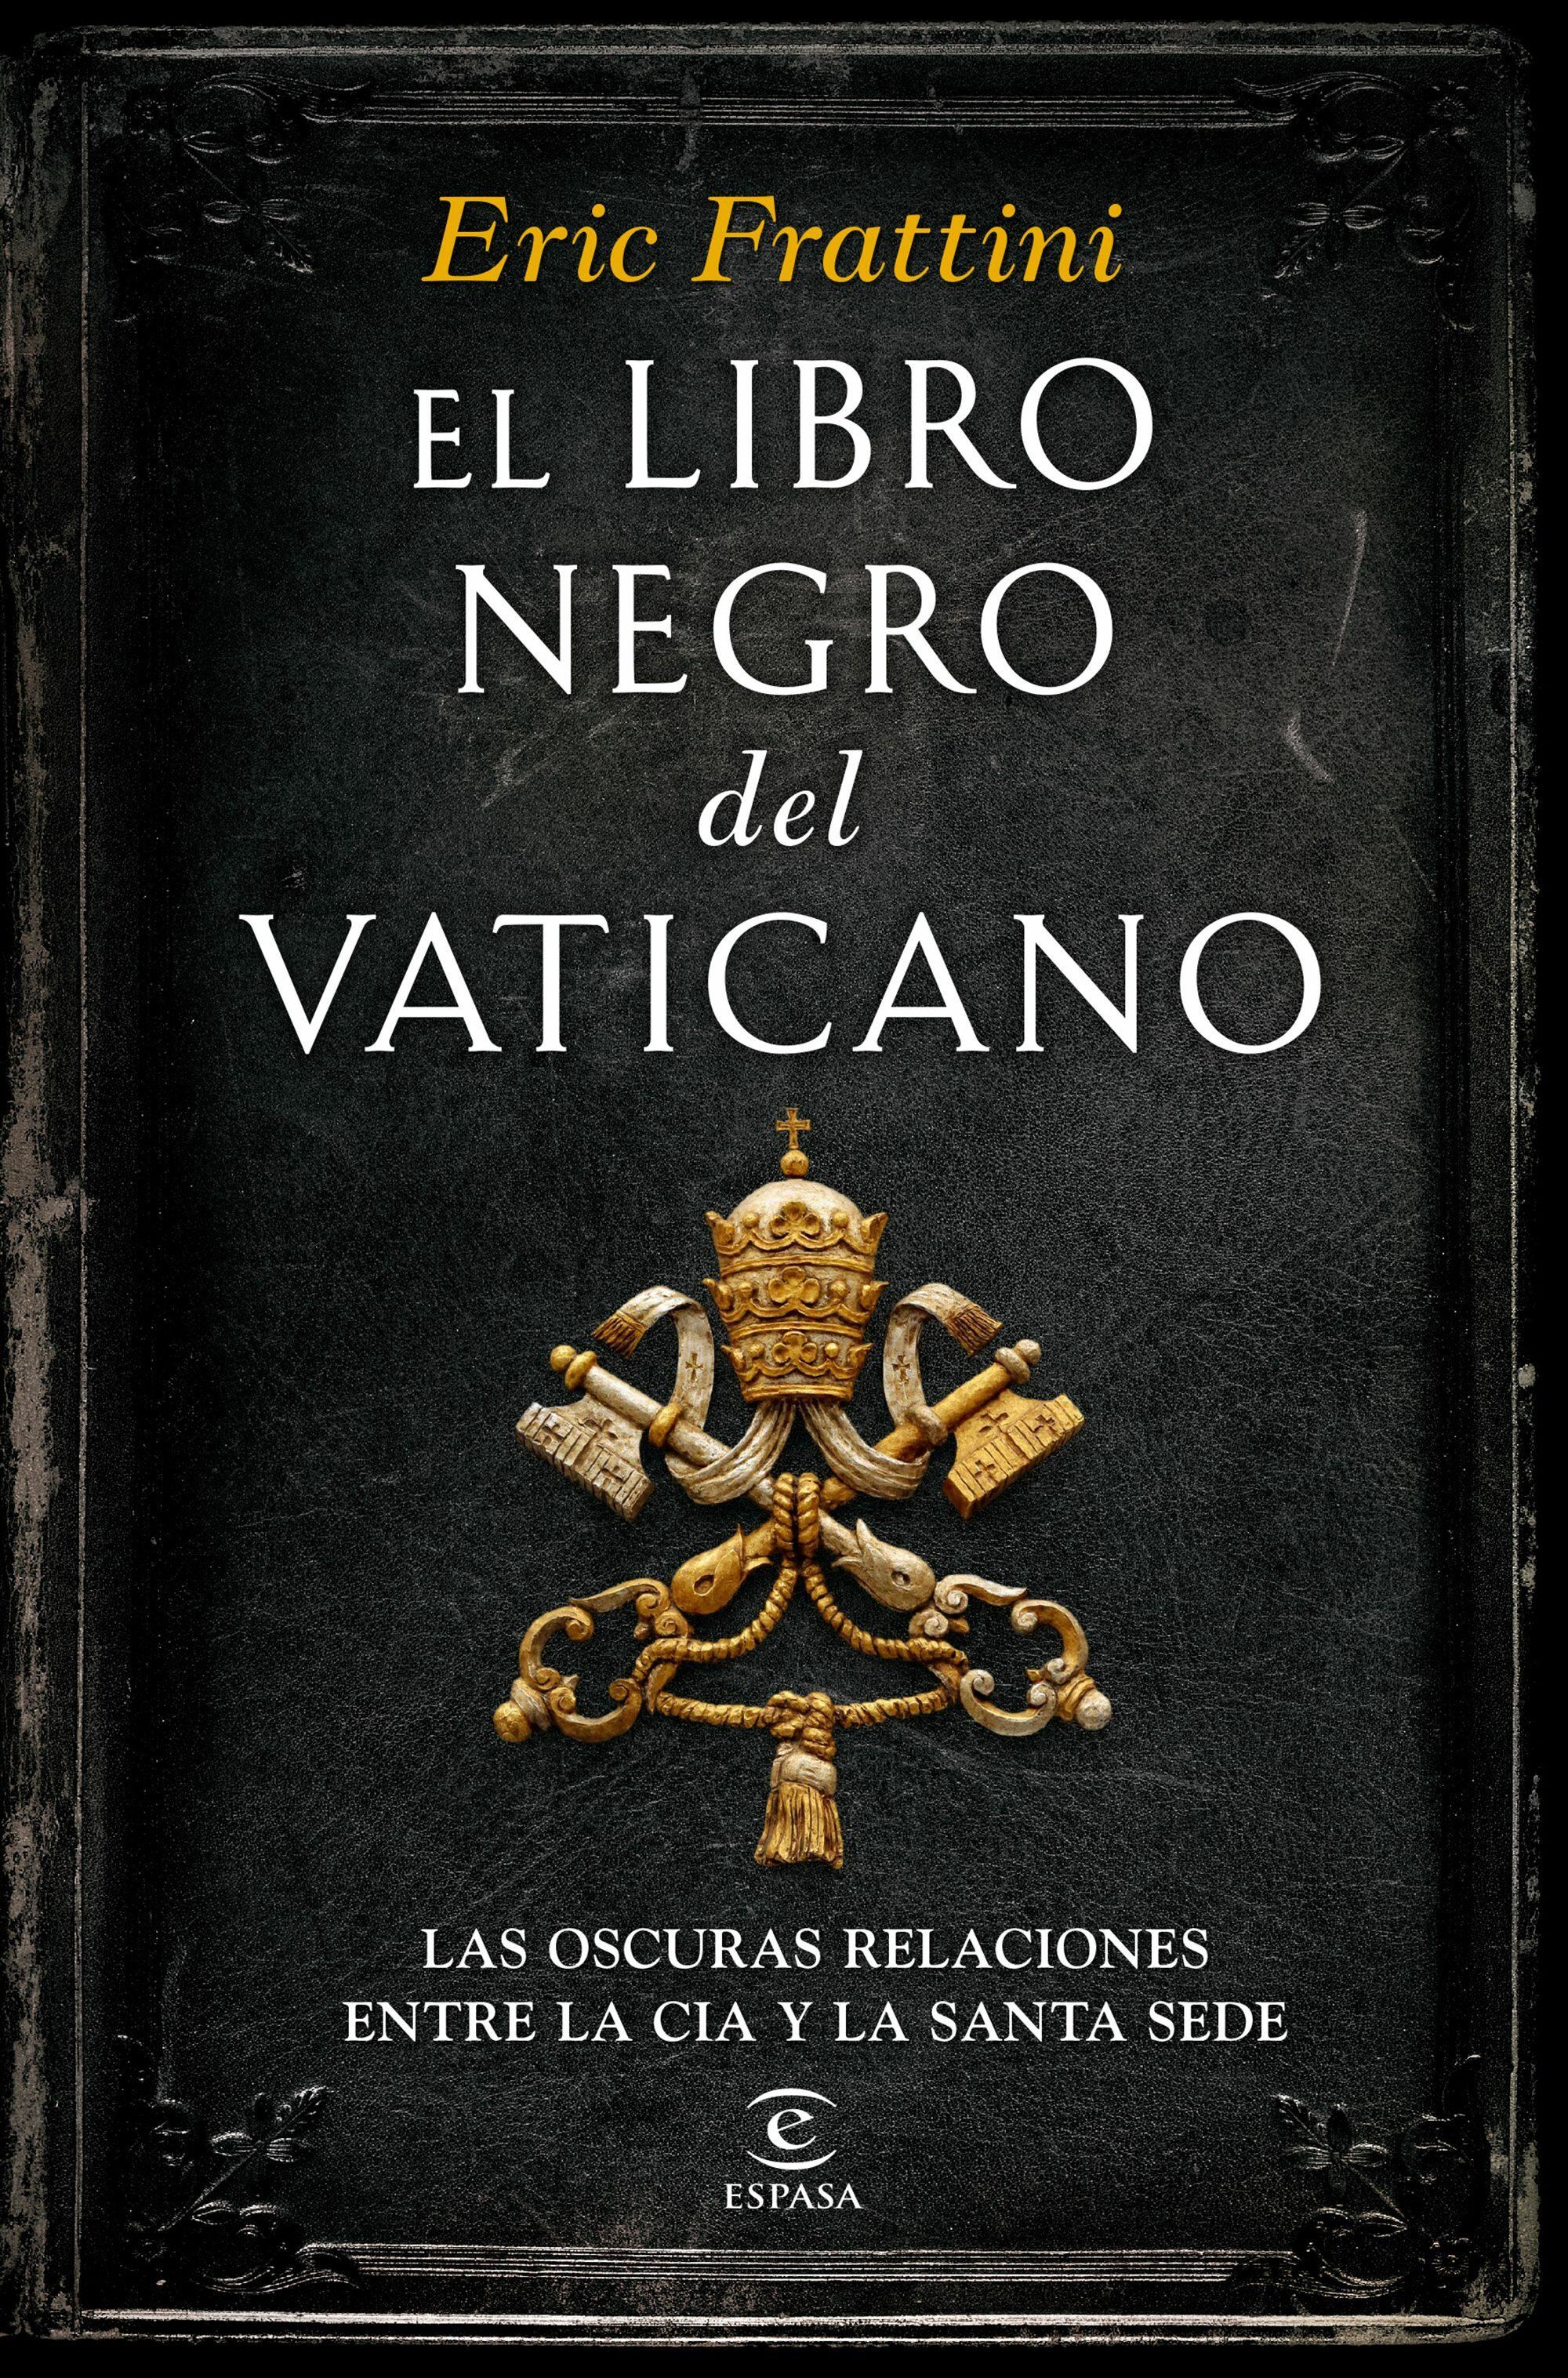 EL LIBRO NEGRO DEL VATICANO   ERIC FRATTINI   Comprar libro ...